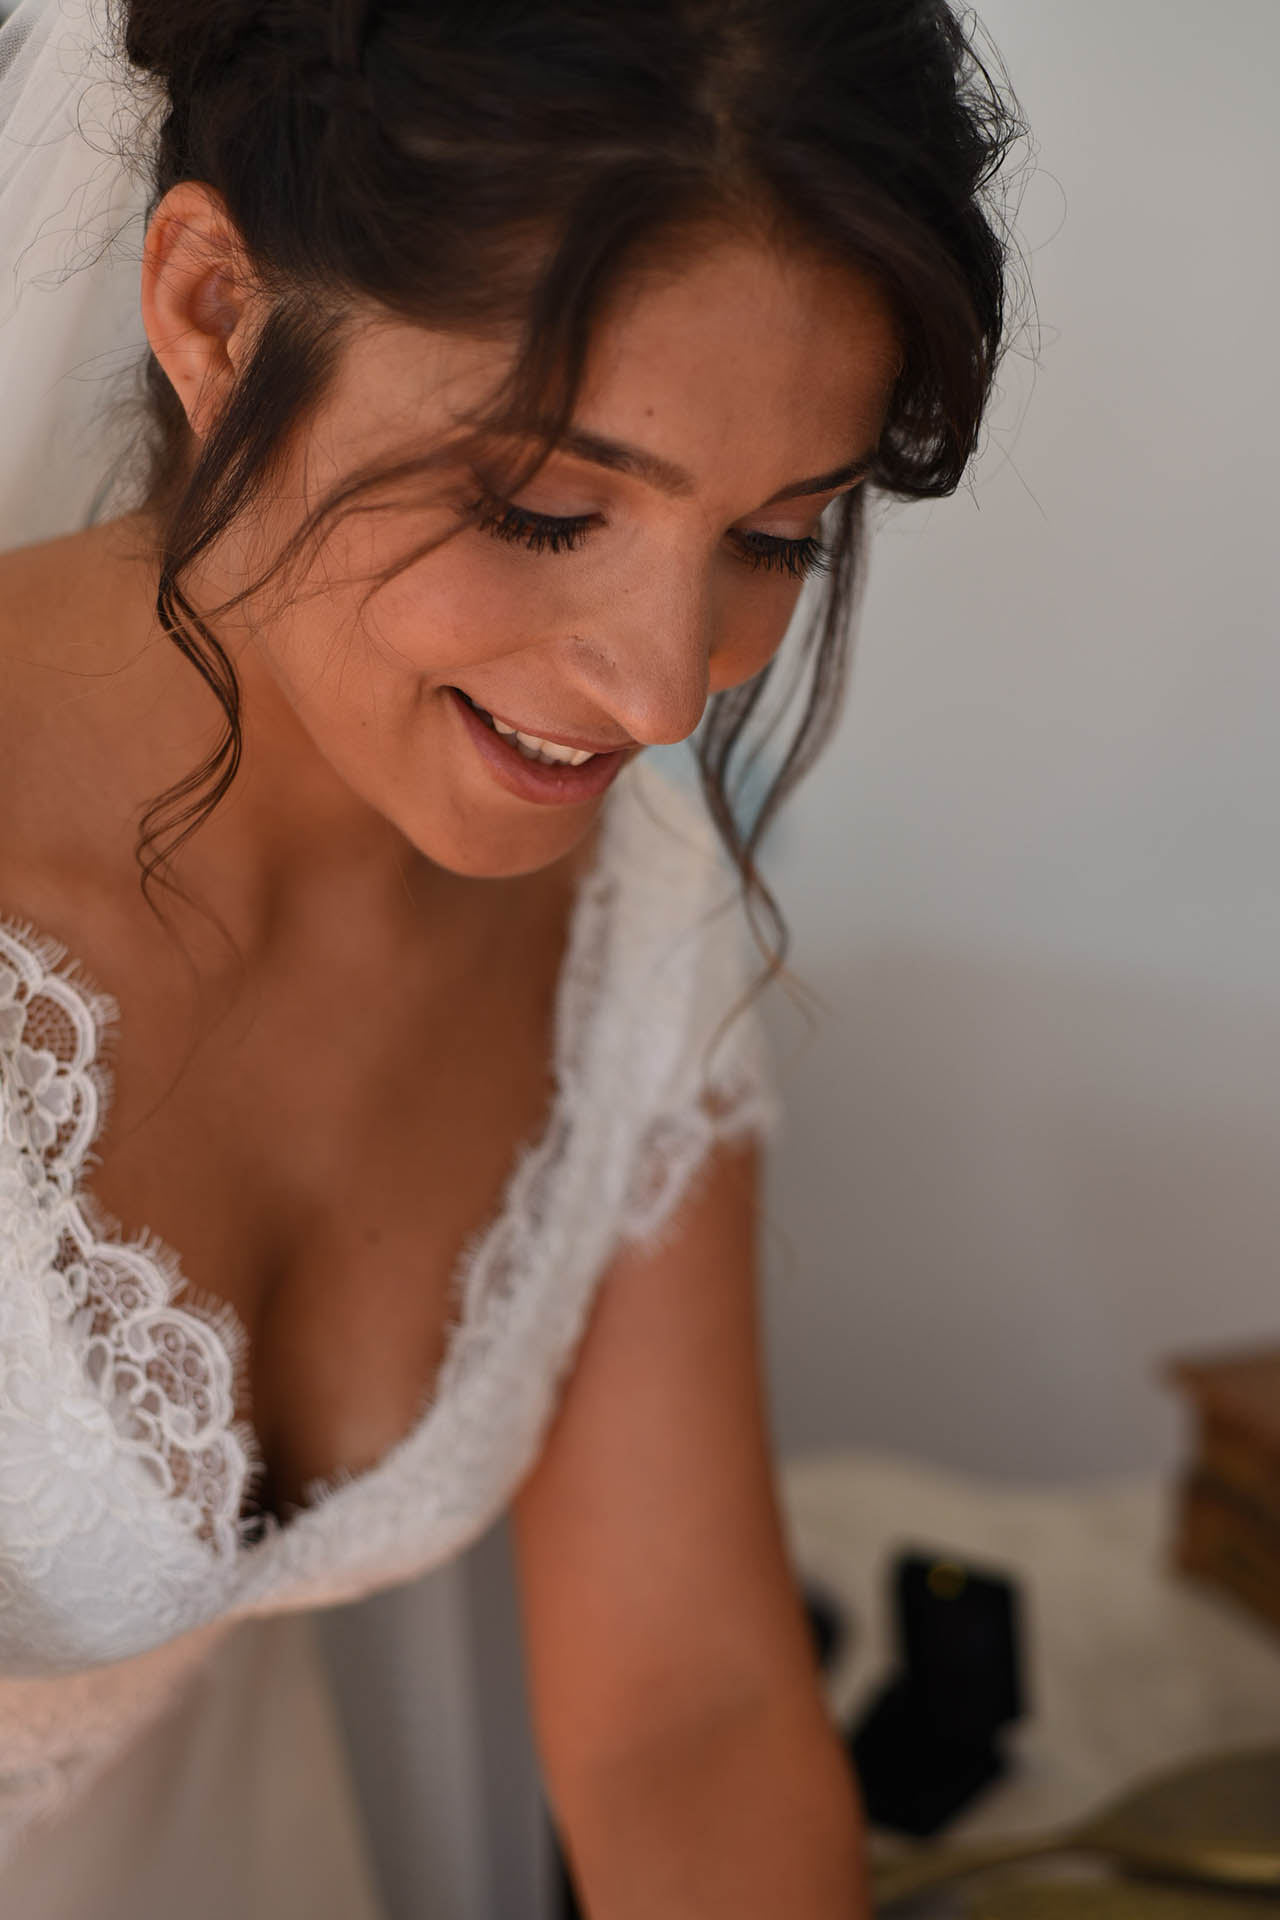 TRUCCO SPOSA Martina Lizzani Beauty Image Lab MakeUp Artist Roma Portfolio 097